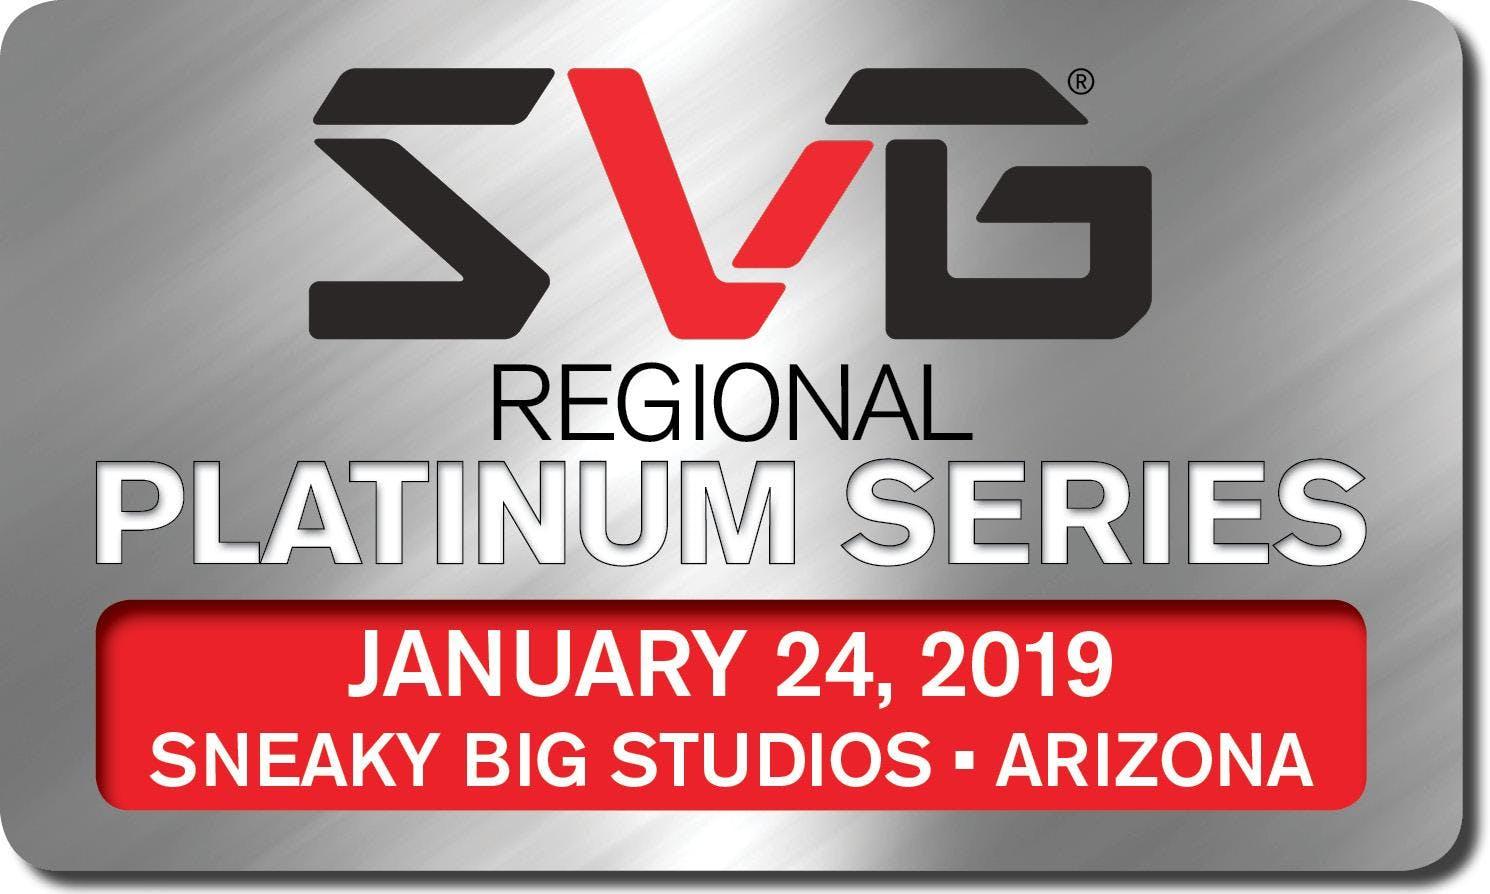 SVG Platinum Regional Series: Arizona